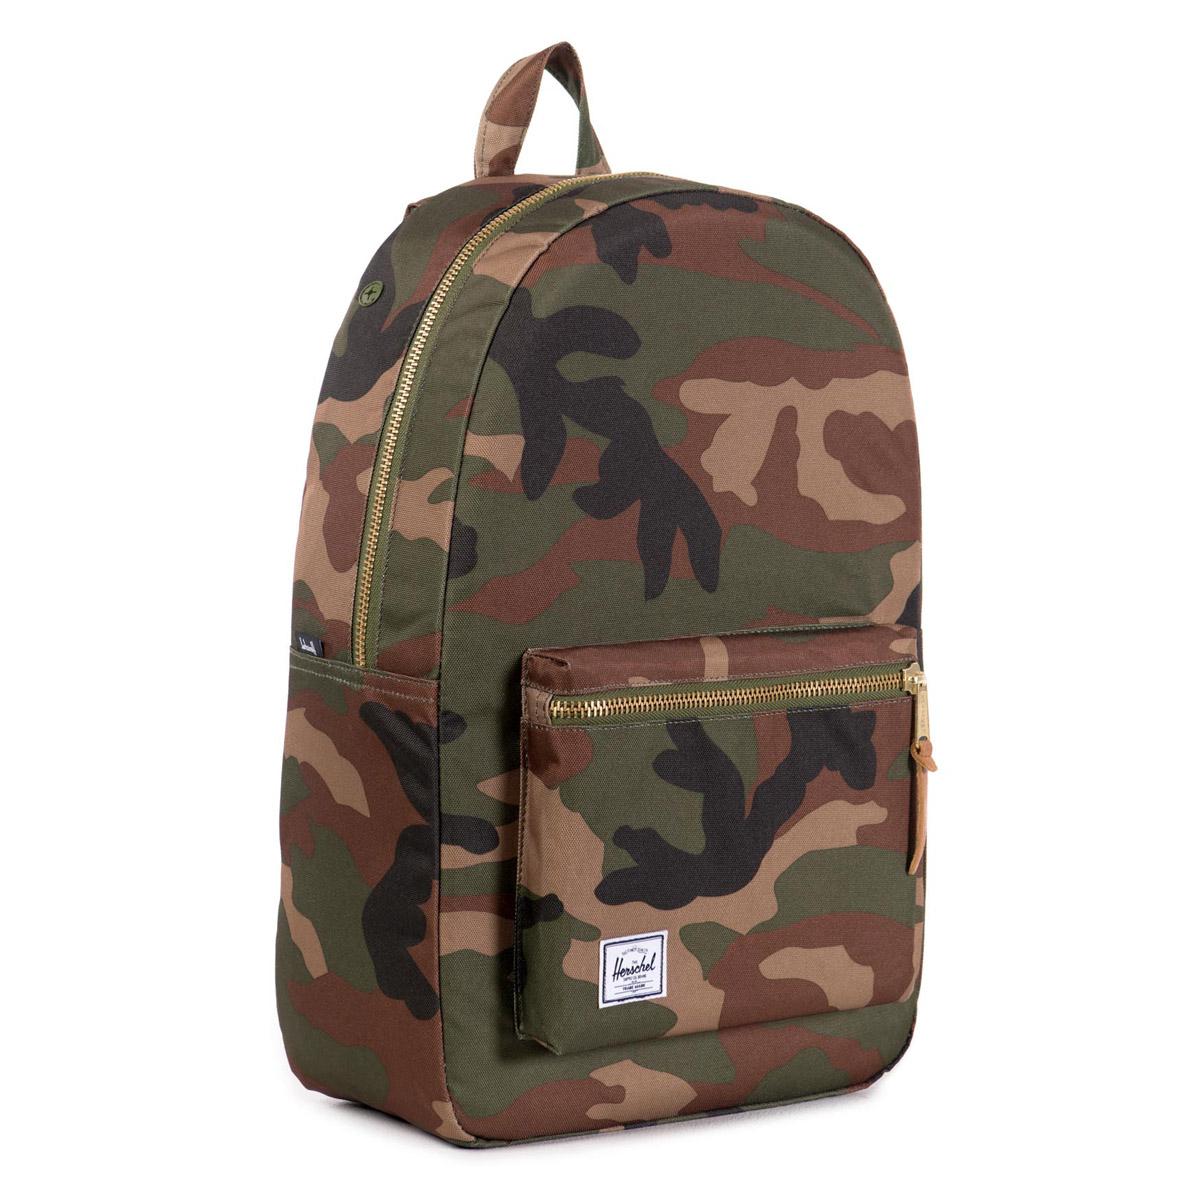 54560ec7fe8 Herschel Supply Co. Woodland Camo Settlement Backpack 828432082384 ...